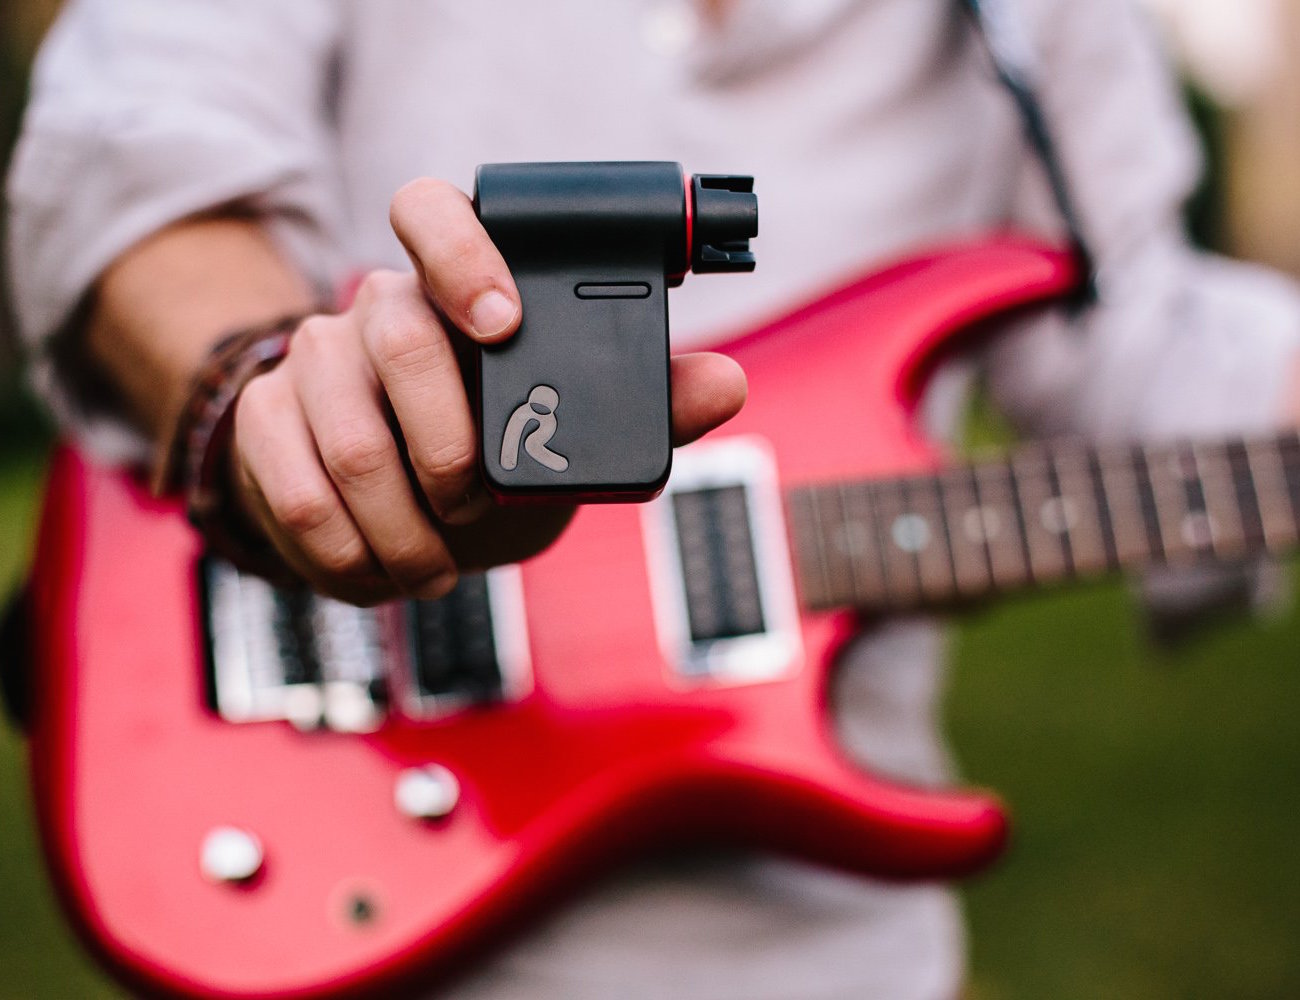 roadie-the-ultimate-guitarist-tool-01